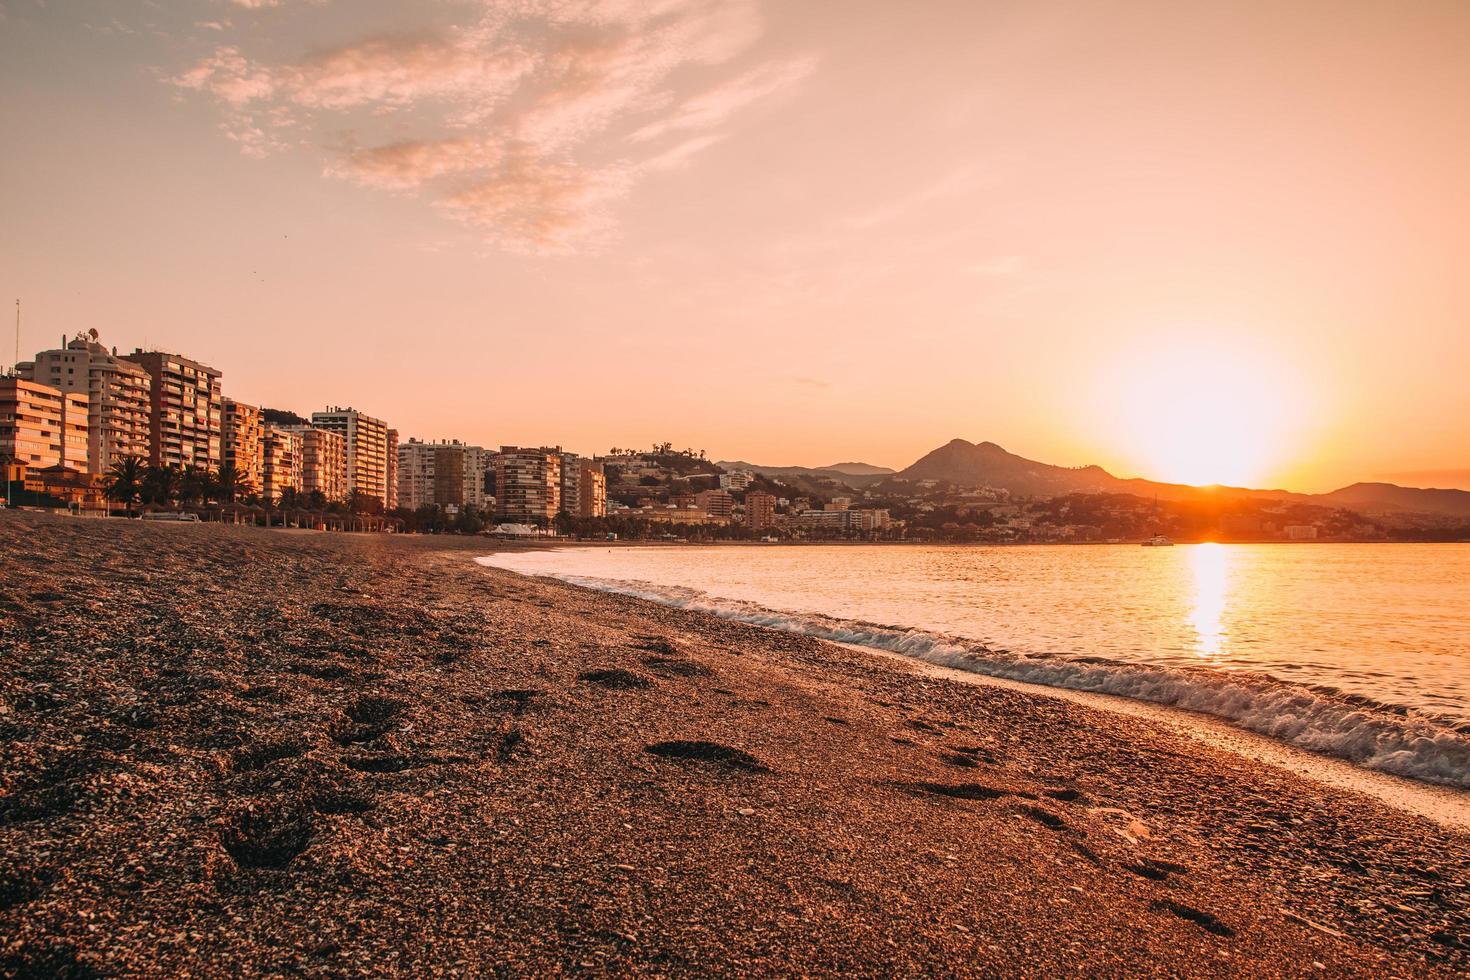 View of city near beach at sunset photo